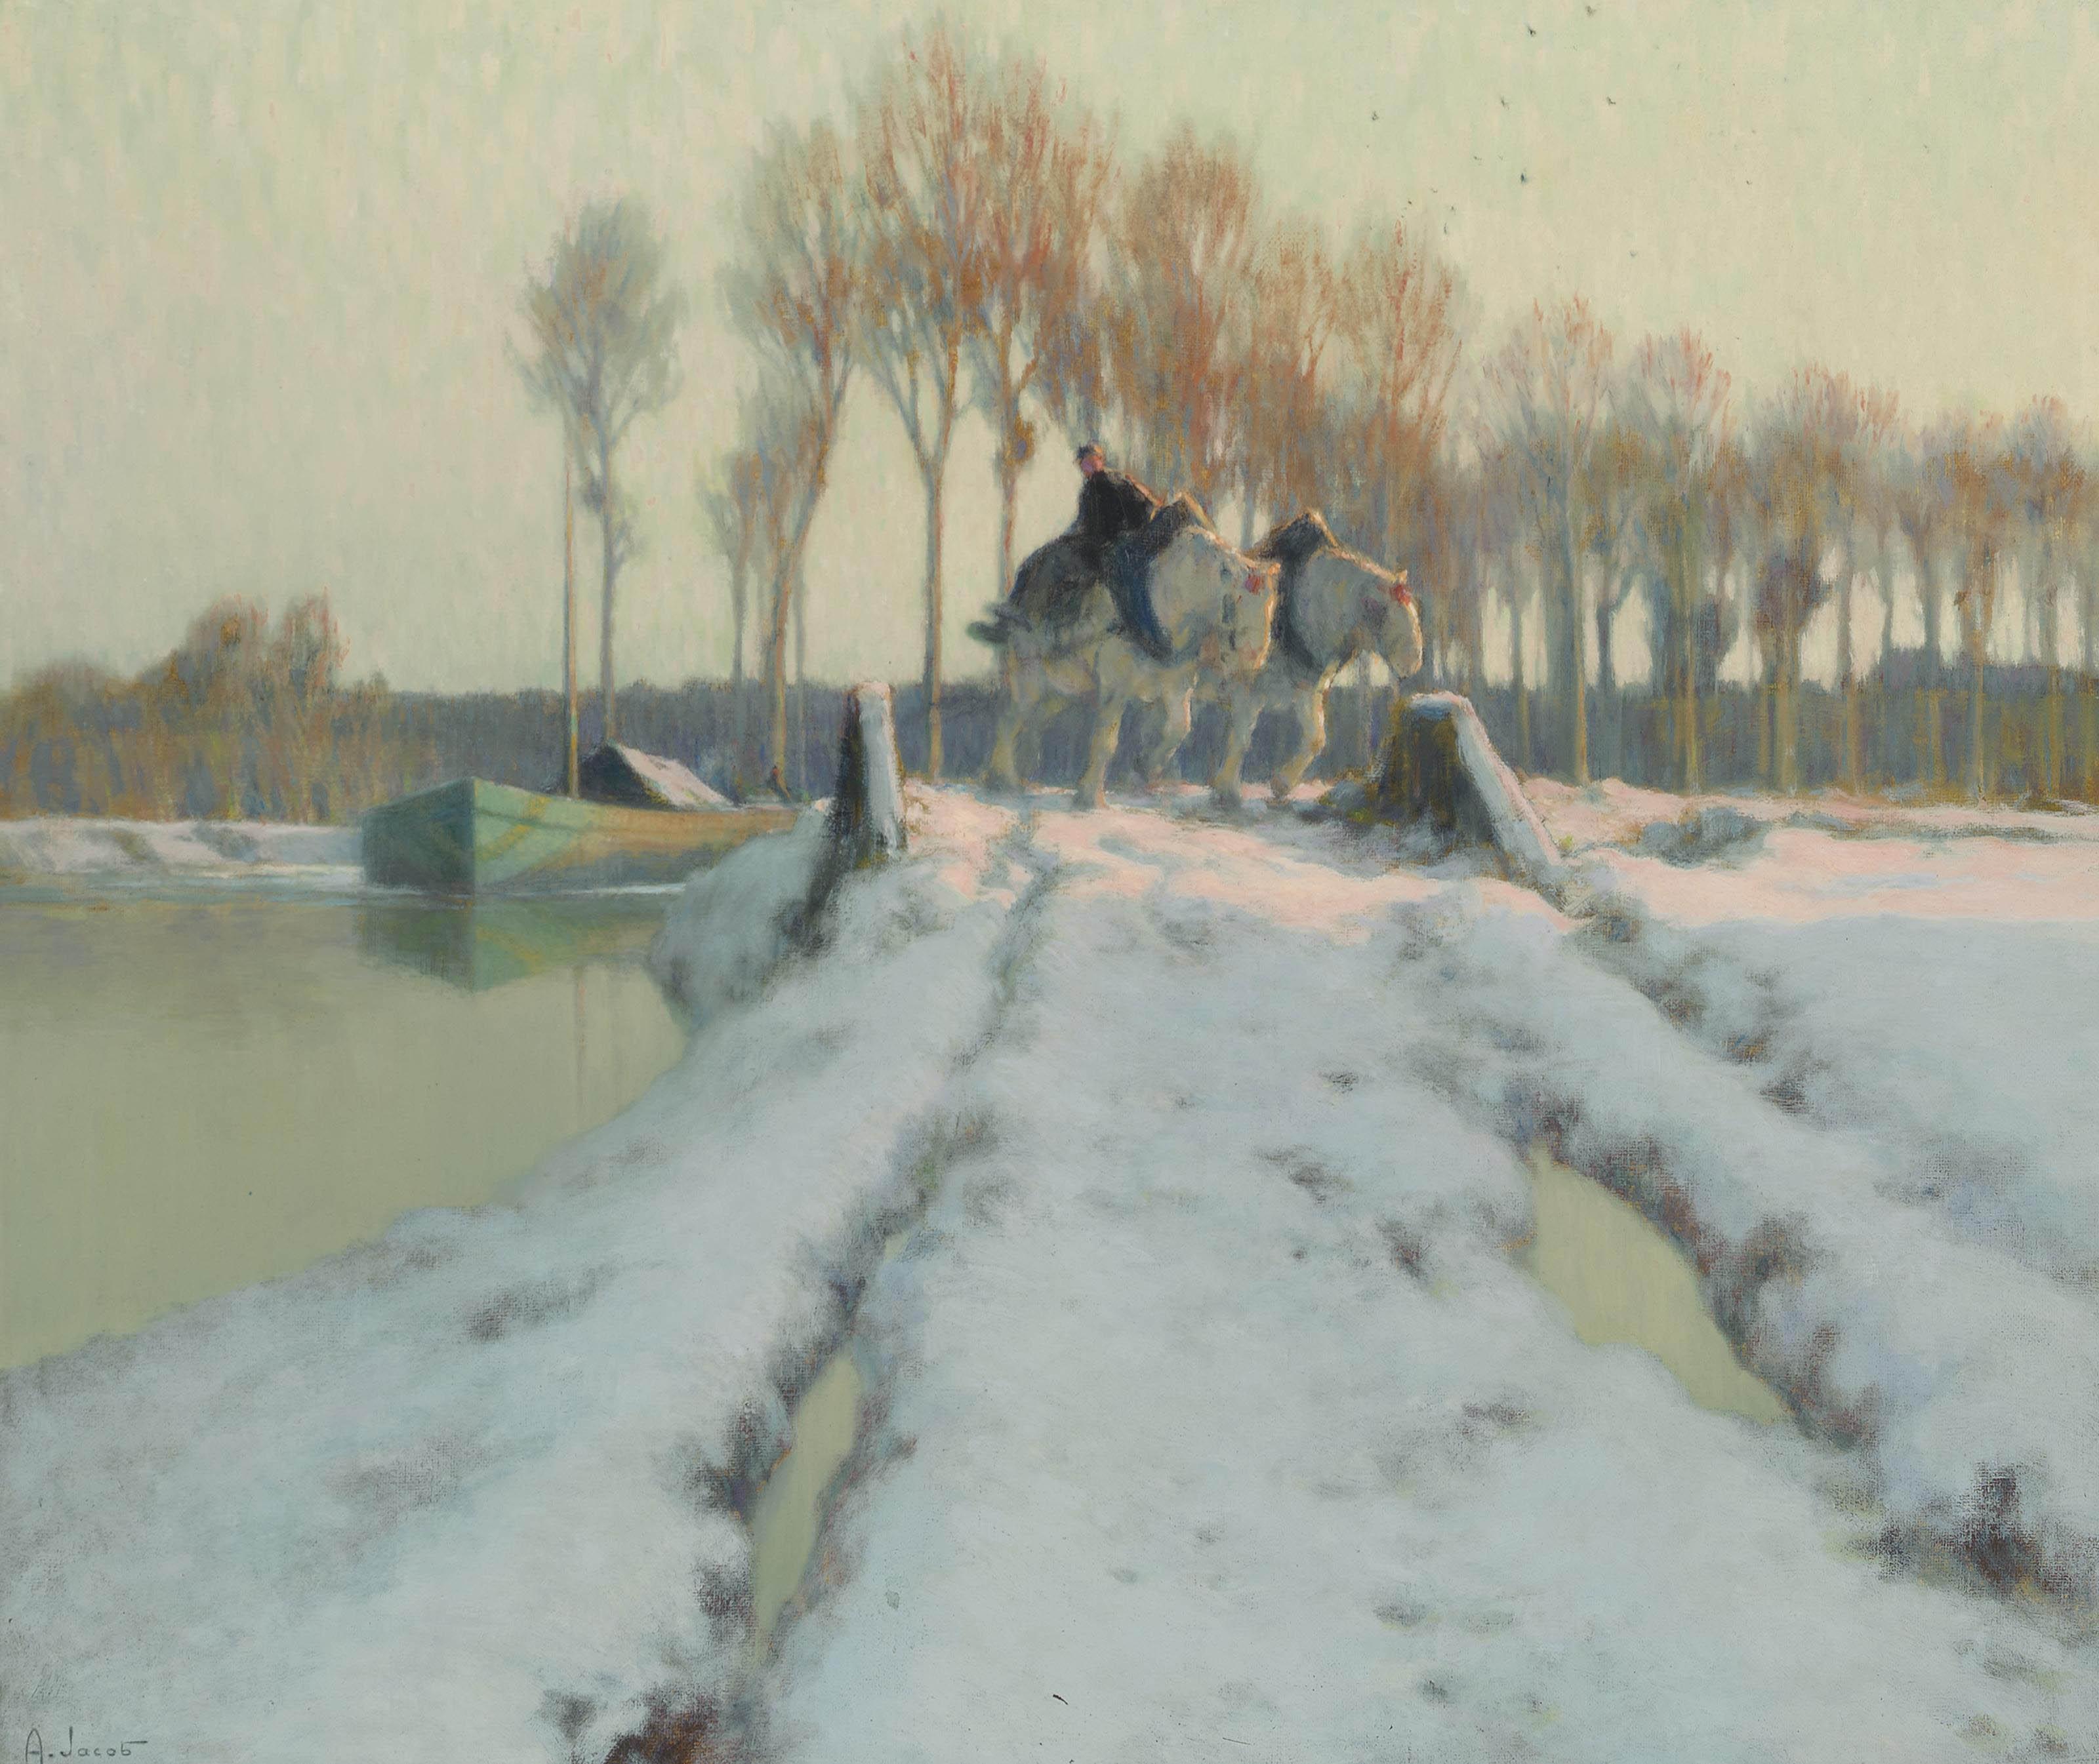 Alexandre-Louis Jacob (French, 1876-1972)